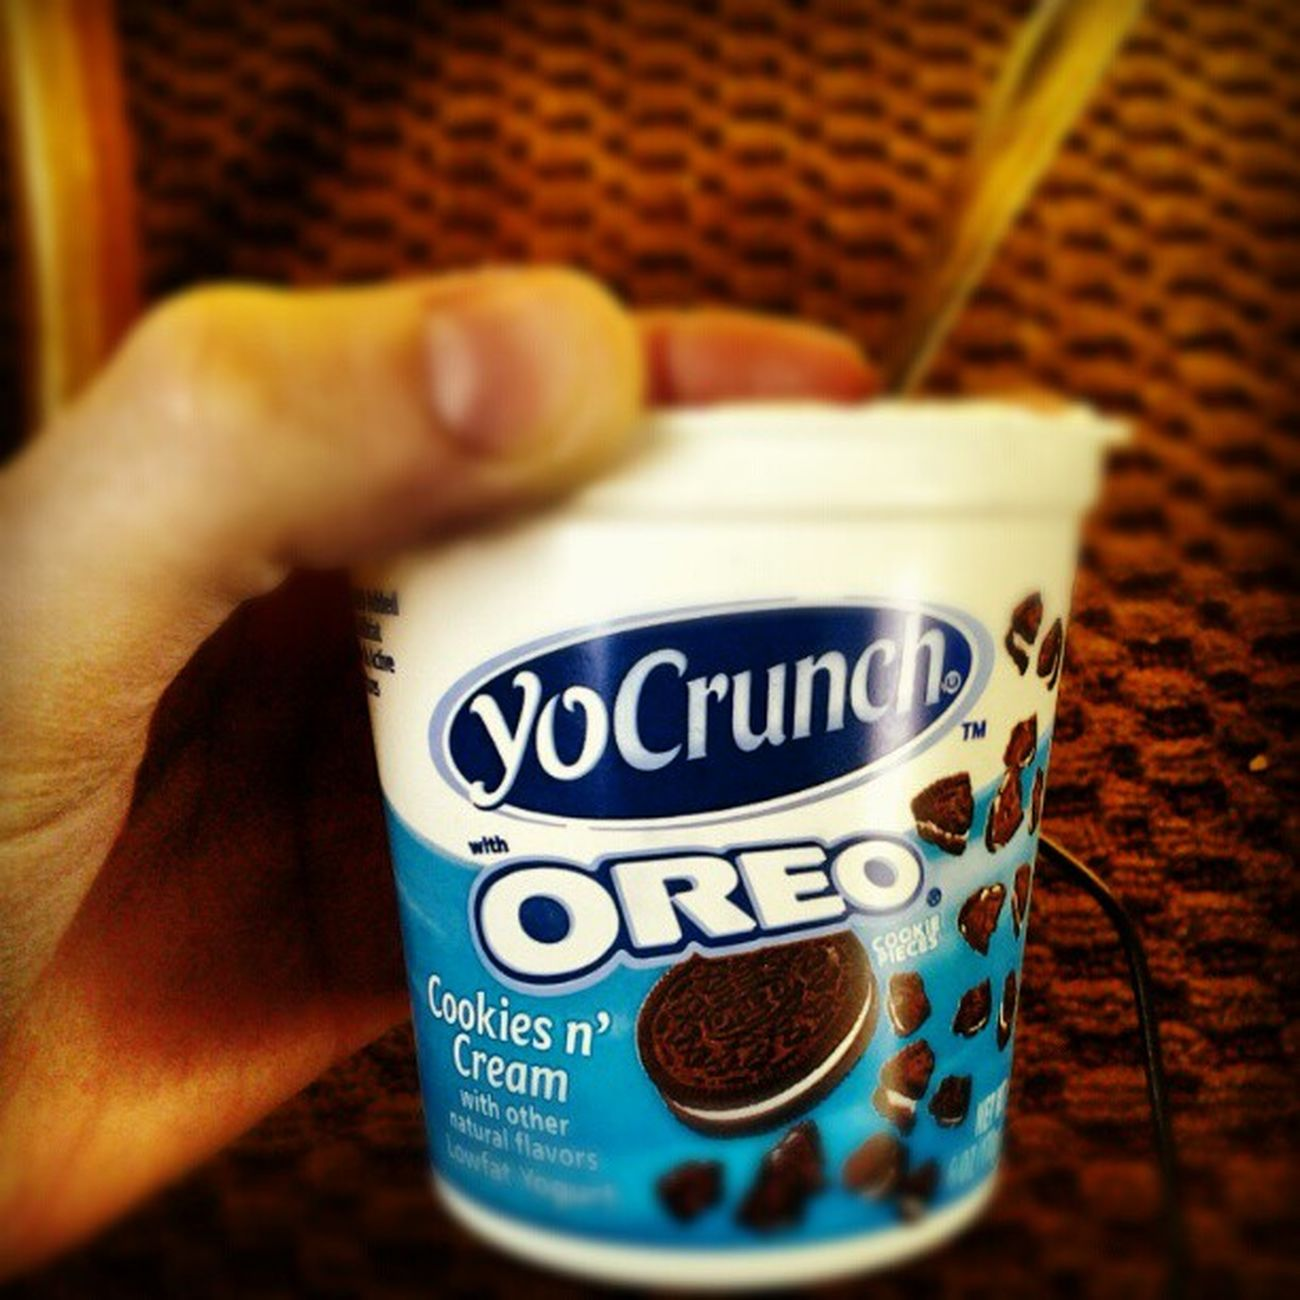 Yocrunch Oreo Breakfast Instagood yum goodmorning sogood yogurt pretendtobehealthy